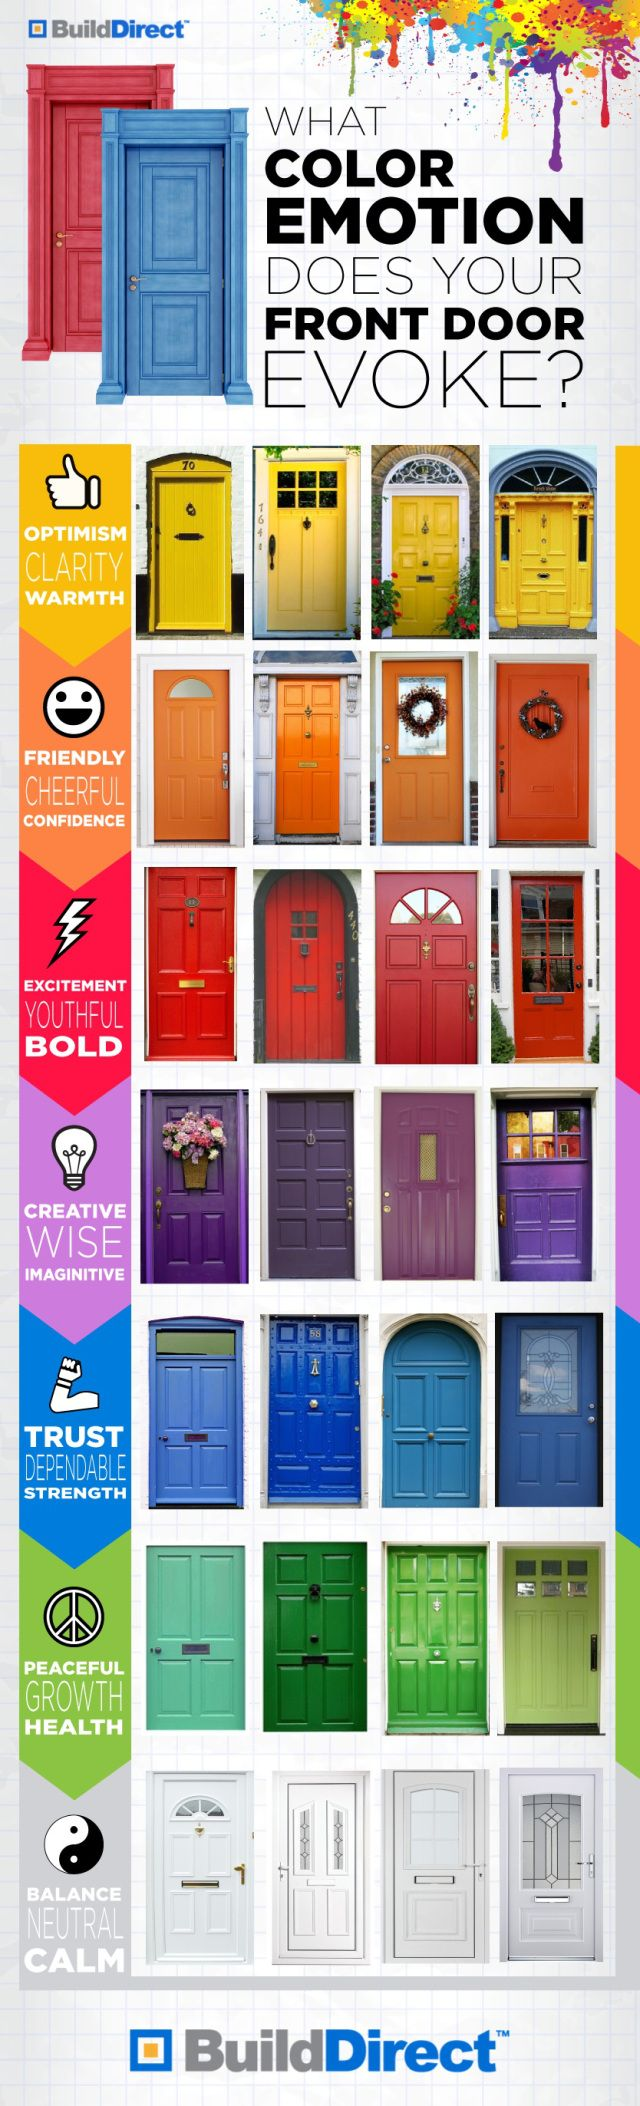 96 best apartment exterior images on pinterest architecture art